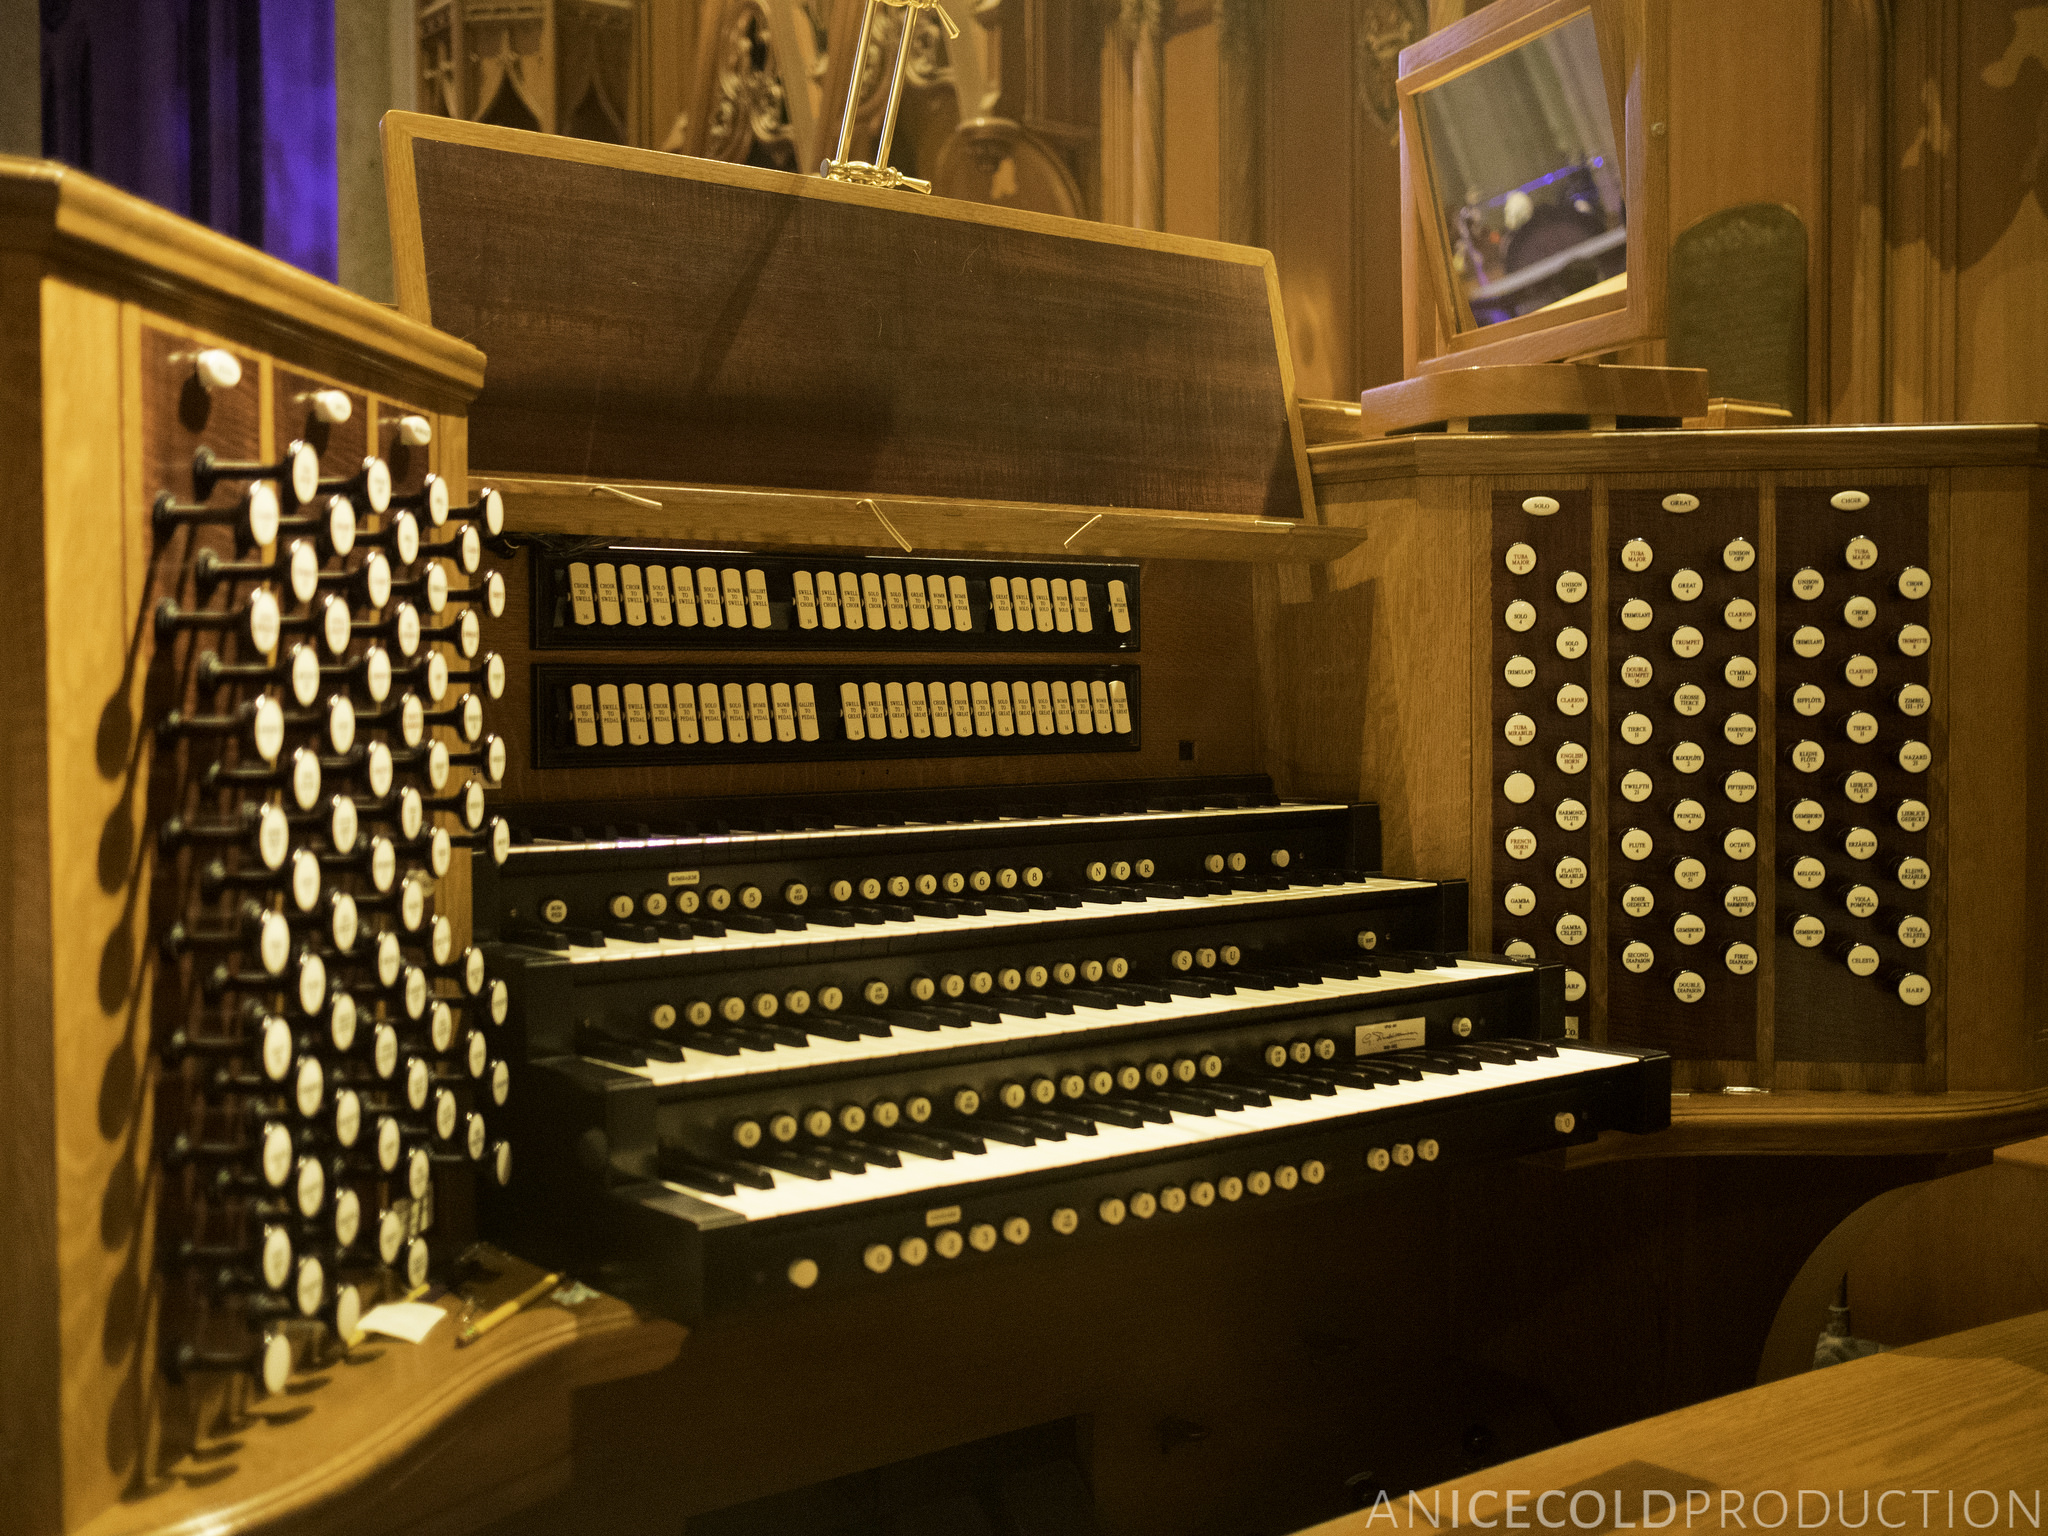 Grace Cathedral organ © Marlon E/Flickr